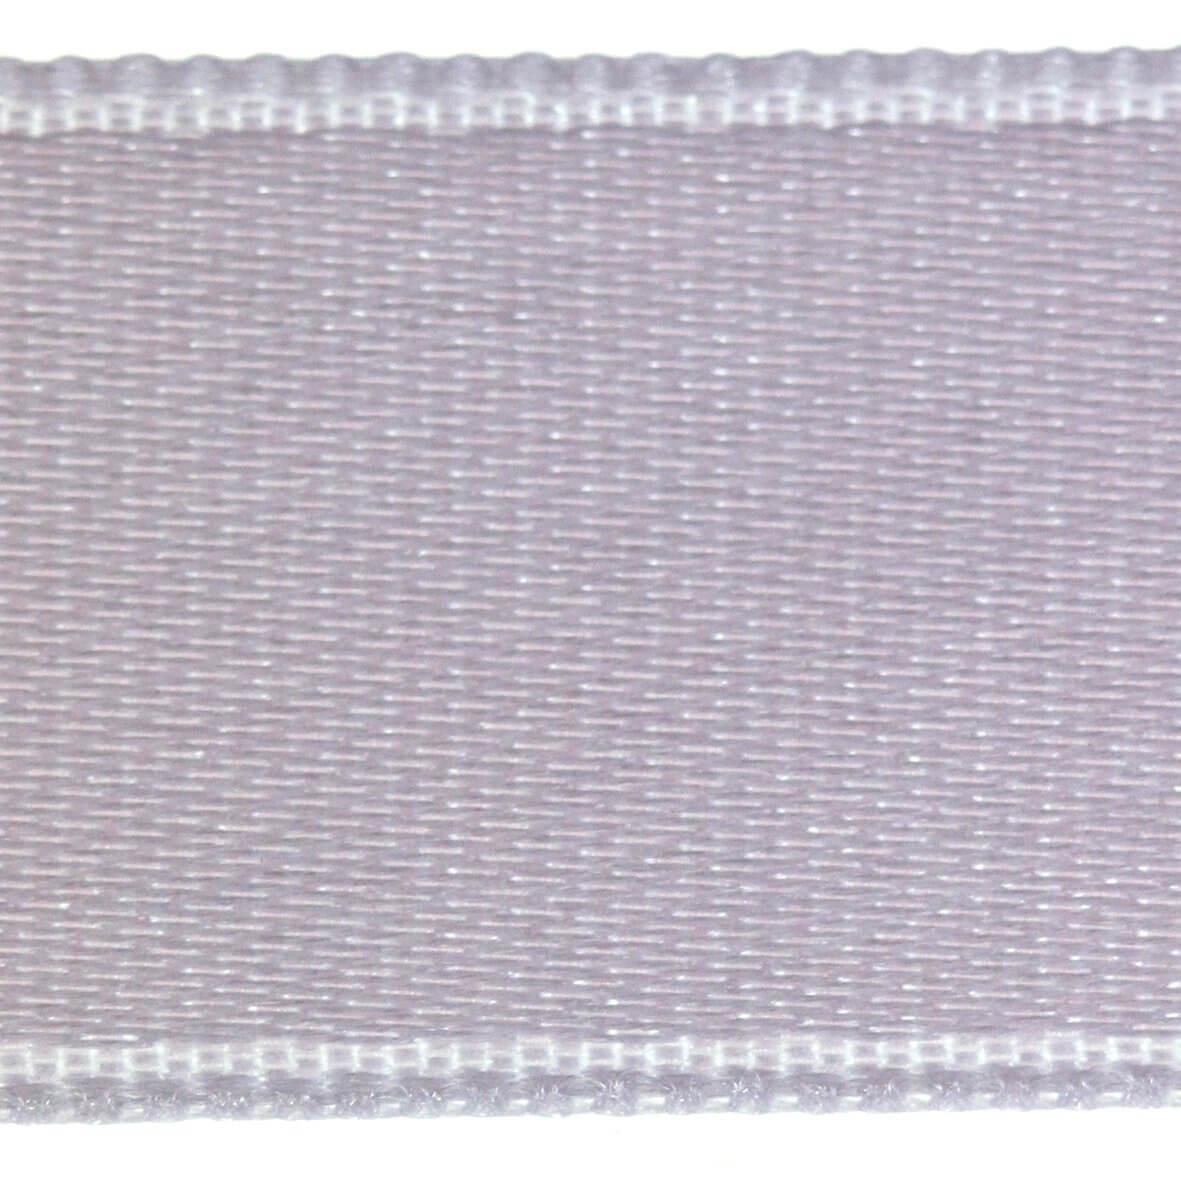 Mercury Silver Col. 316 - 25mm Satab Satin Ribbon